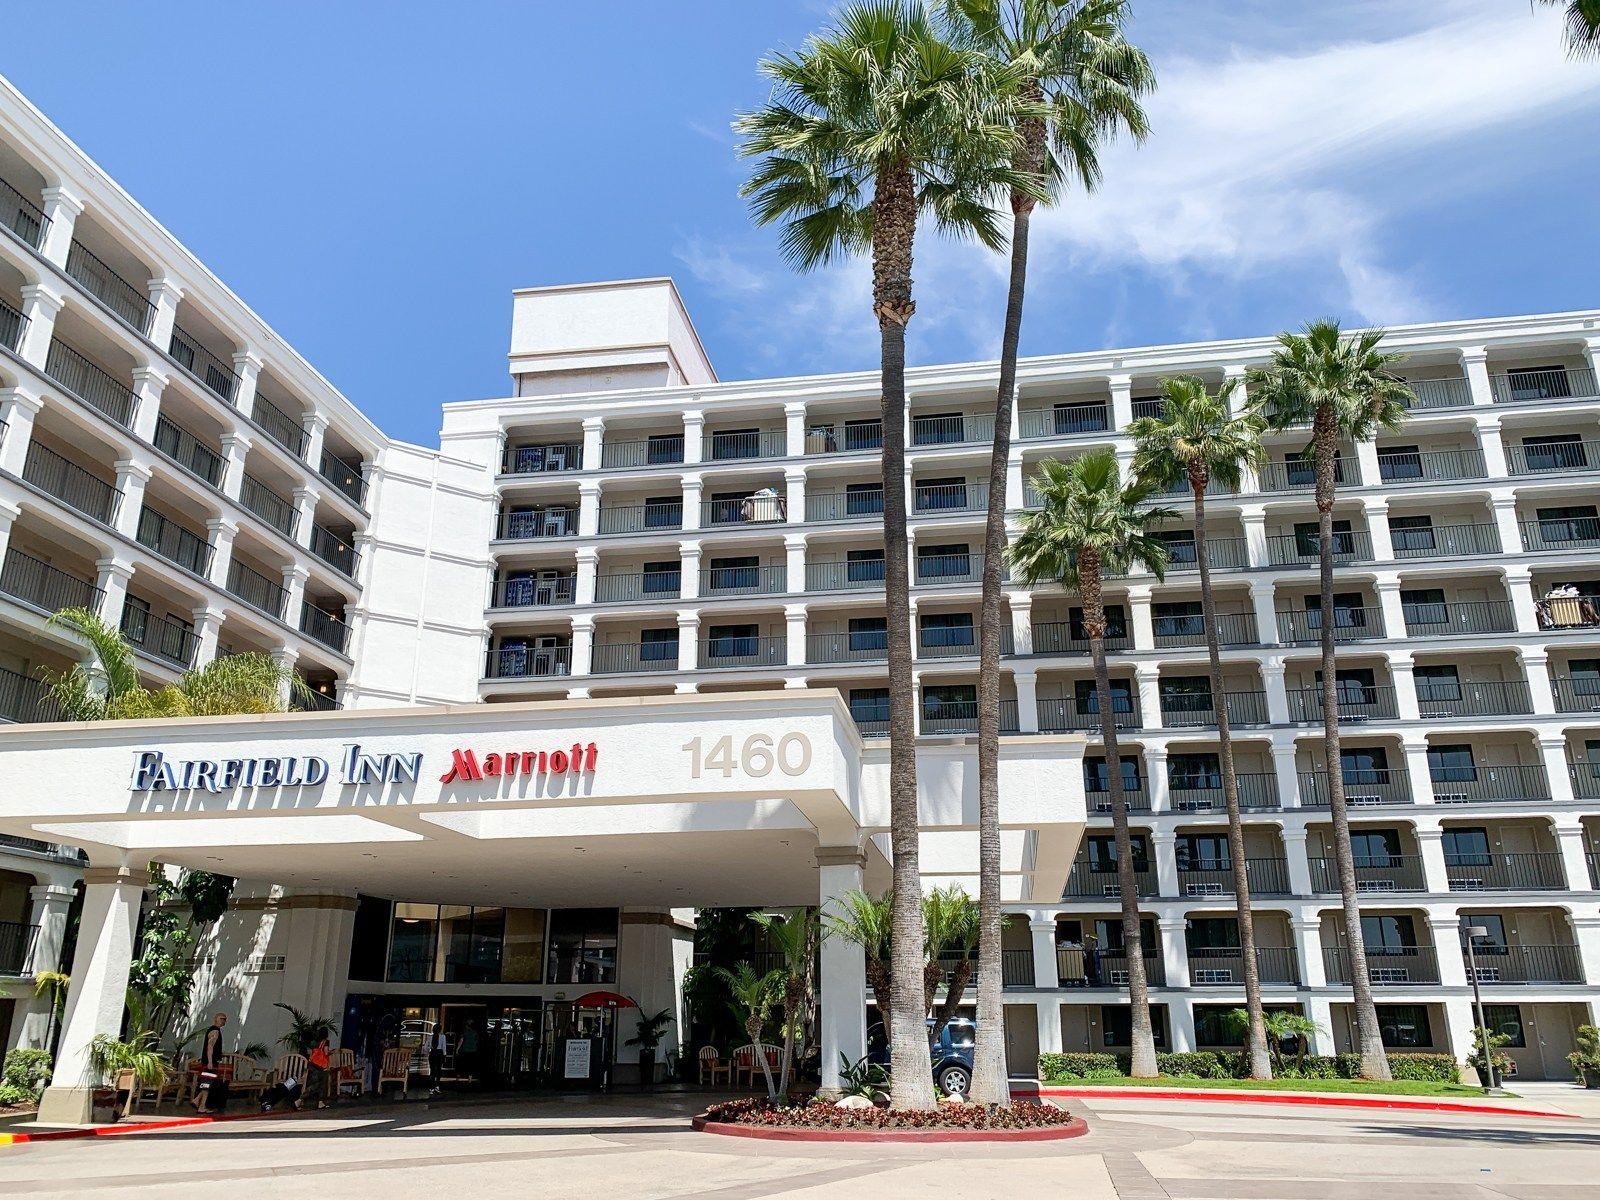 Disneyland S Affordable Neighbor A Review Of Fairfield Inn By Marriott Anaheim Resort The Points Guy Fairfield Inn Fairfield Hotel Disneyland Hotel